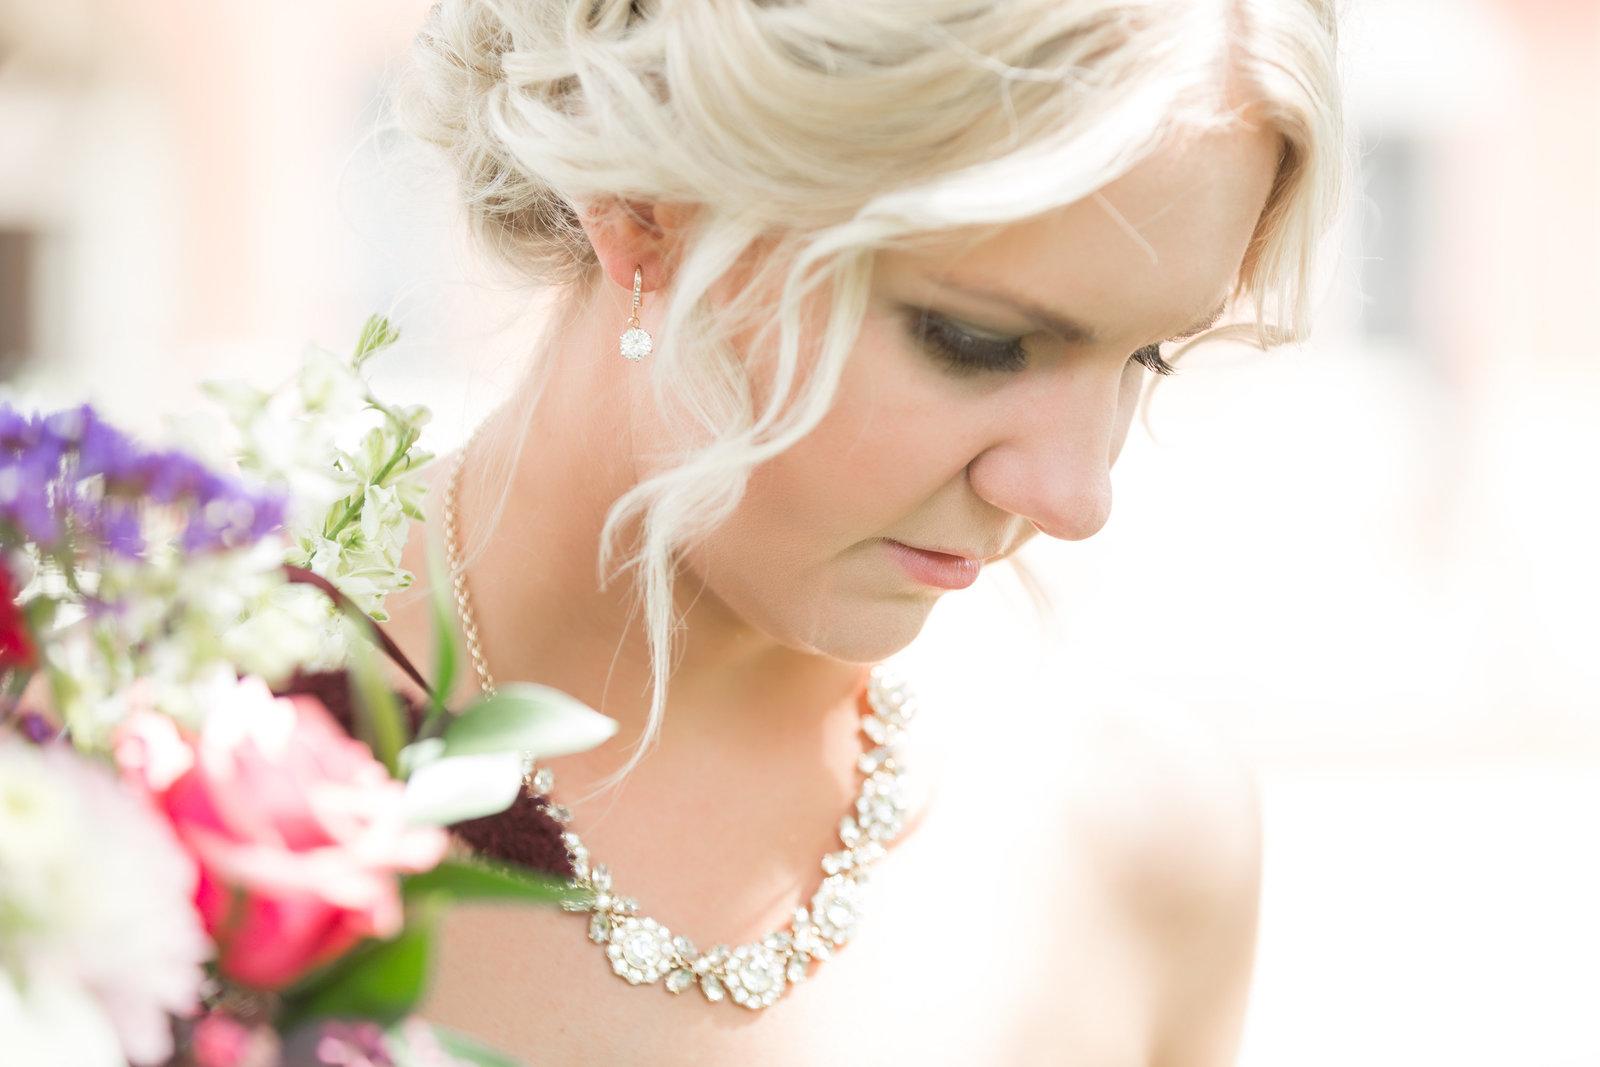 PIX_5364Angela-Elisabeth-Portraits-Wedding-